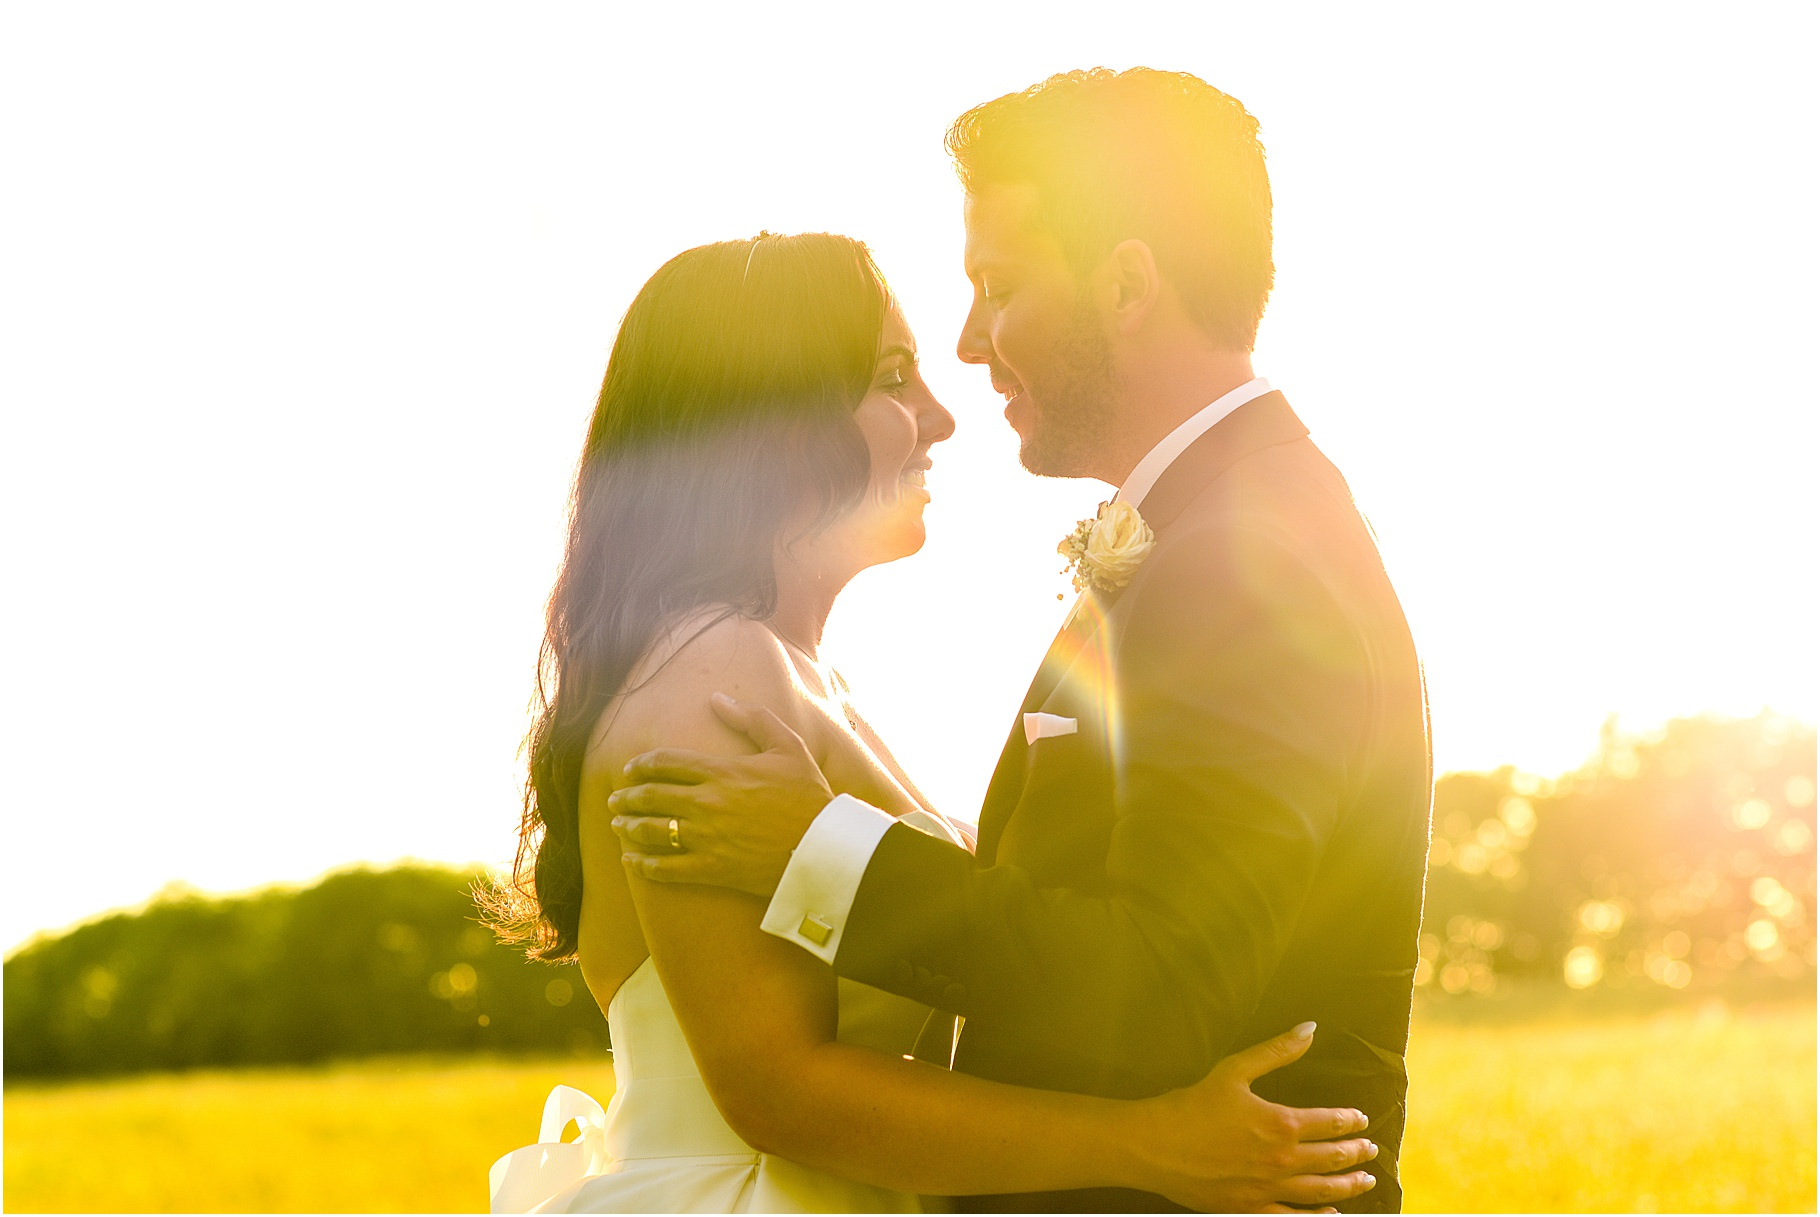 dan-wootton-photography-2017-weddings-080.jpg